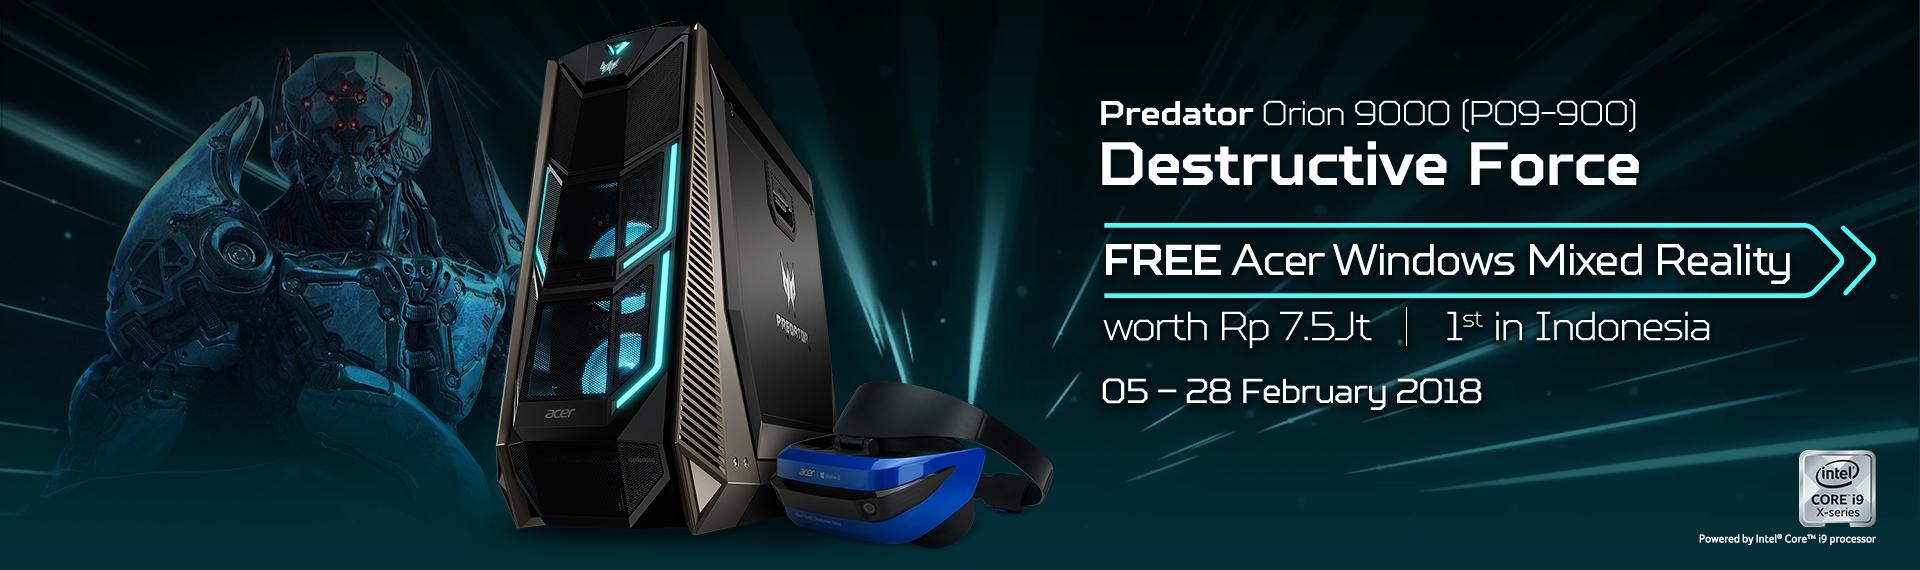 Beli Predator Orion 9000, Gratis Acer Windows Mixed Reality!